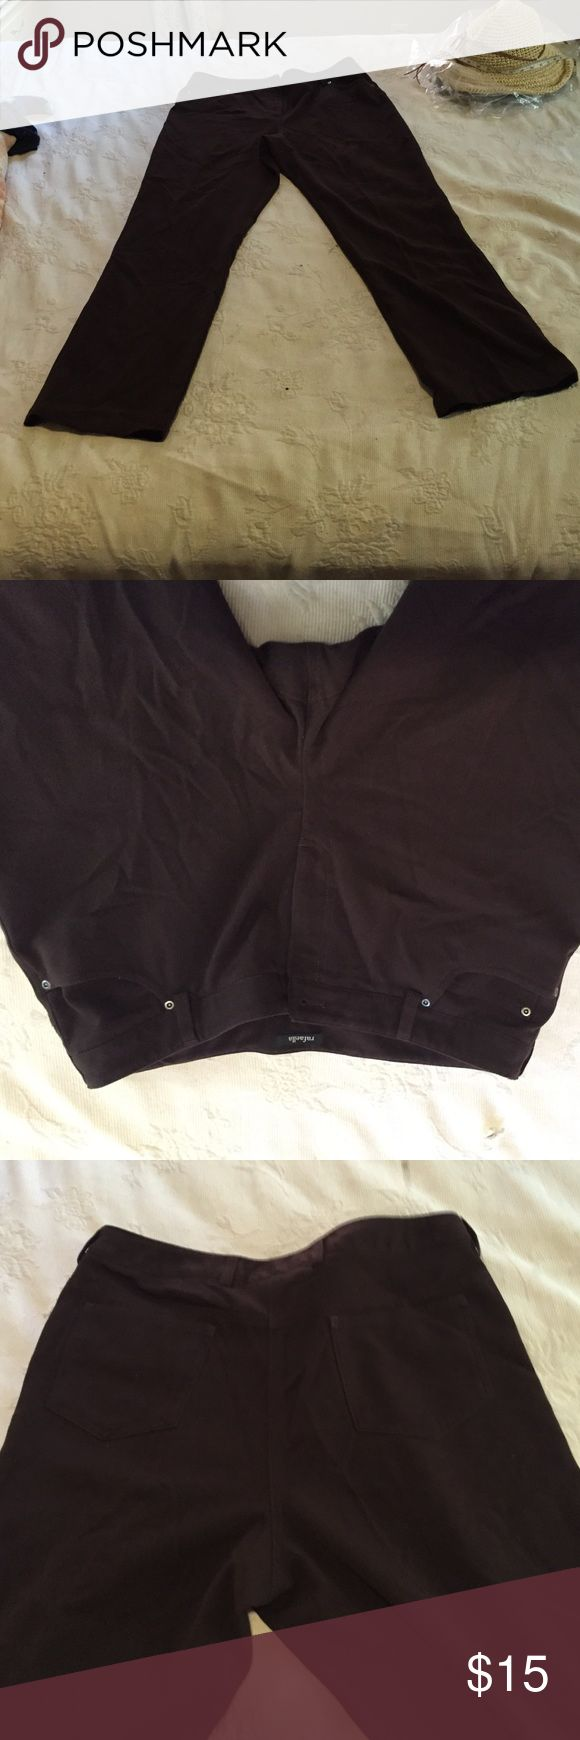 EUC Chocolate Brown Slacks by Rafaella, 16 Excellent used condition chocolate brown pants by Rafaella. Straight leg. Size 16. Rafaella Pants Trousers